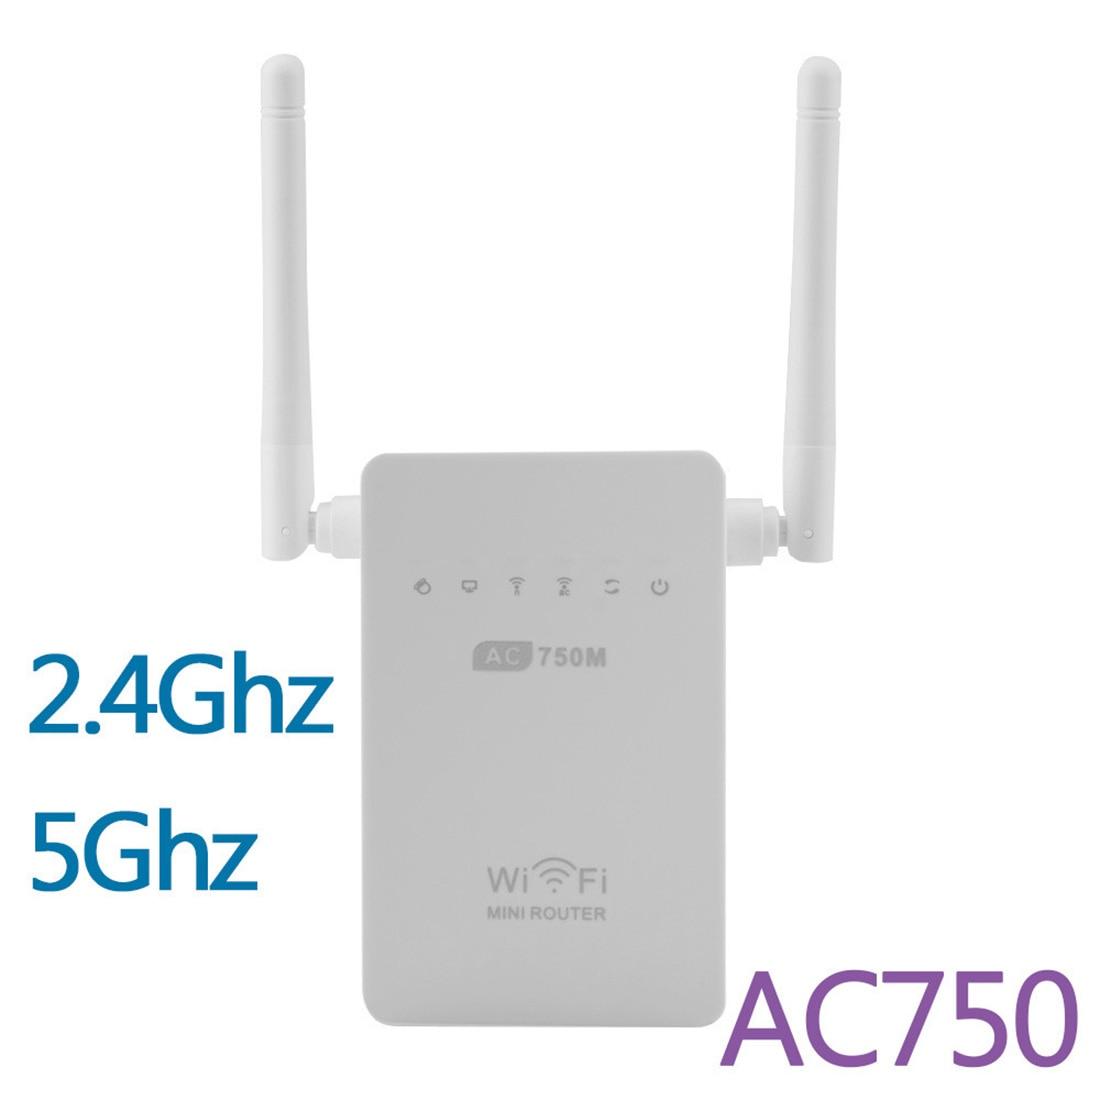 NOYOKERE 750M Wireless-AC Router AC750 Dual Band 2.4GHz/5GHz Wifi Repeater Extender Booster 802.11AC WPS AP Antenna EU/US